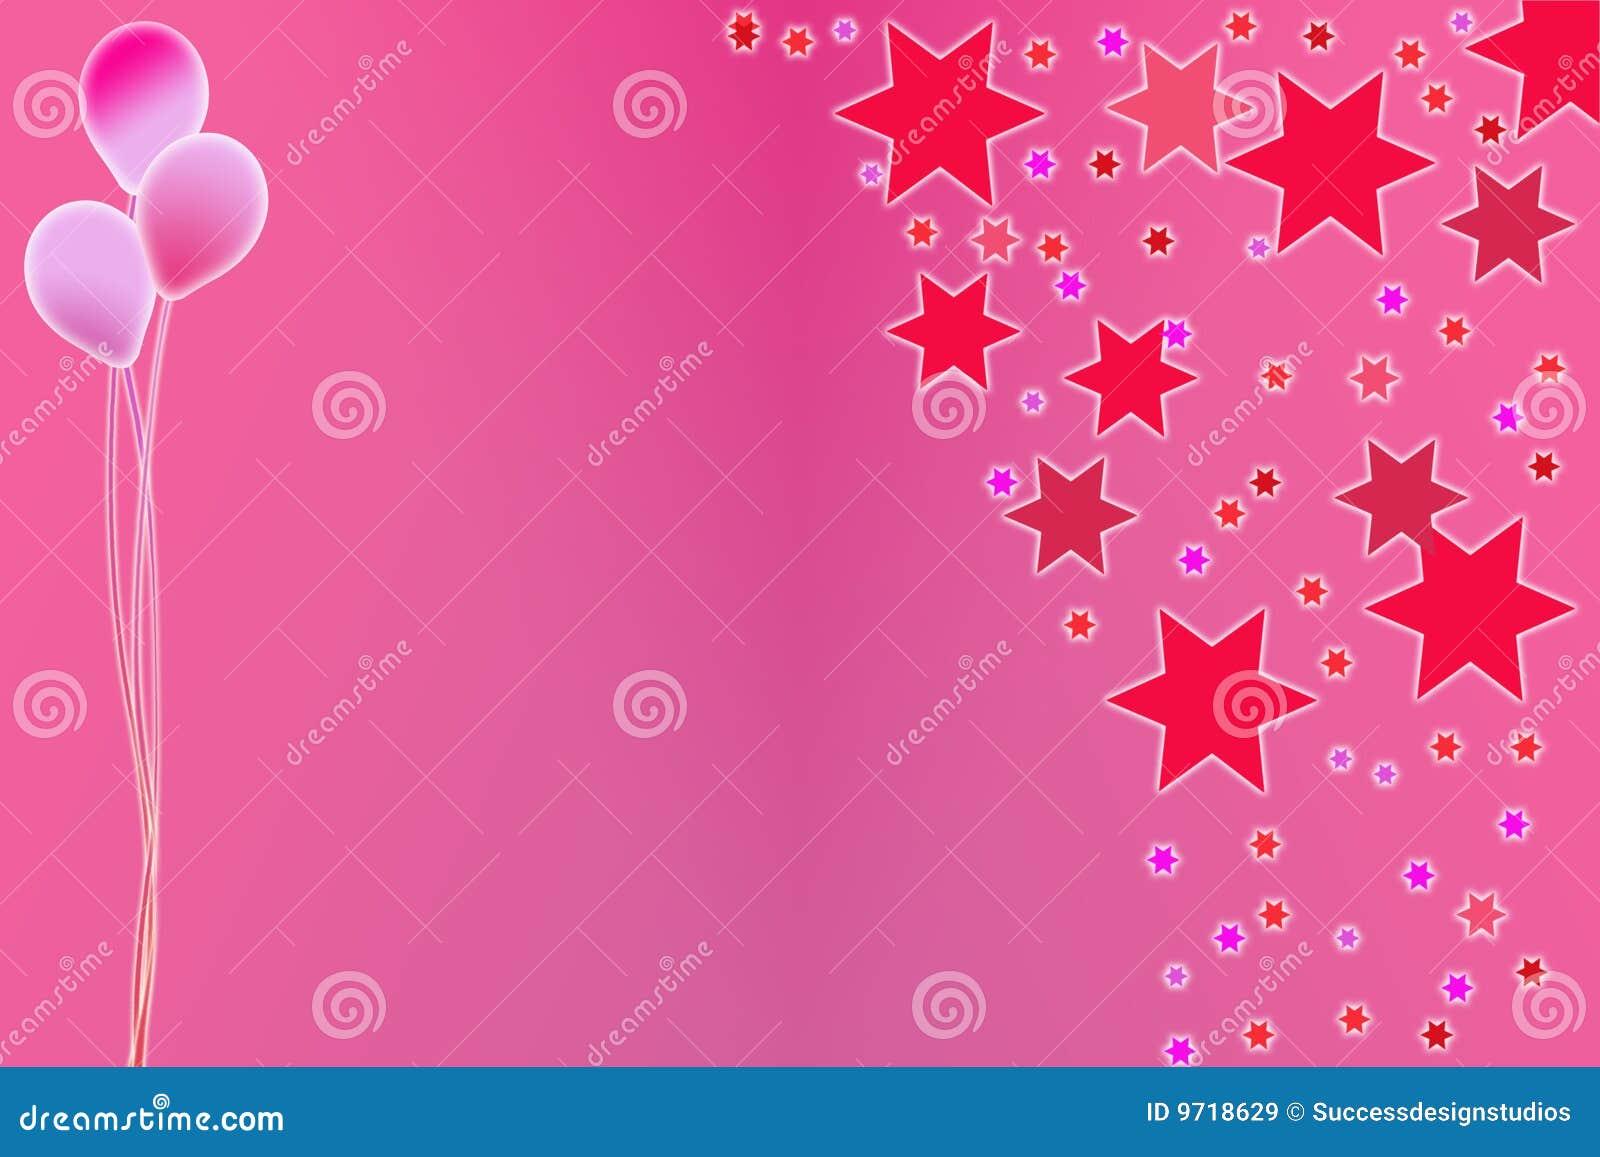 Girls Party Invitation stock illustration. Illustration of ...